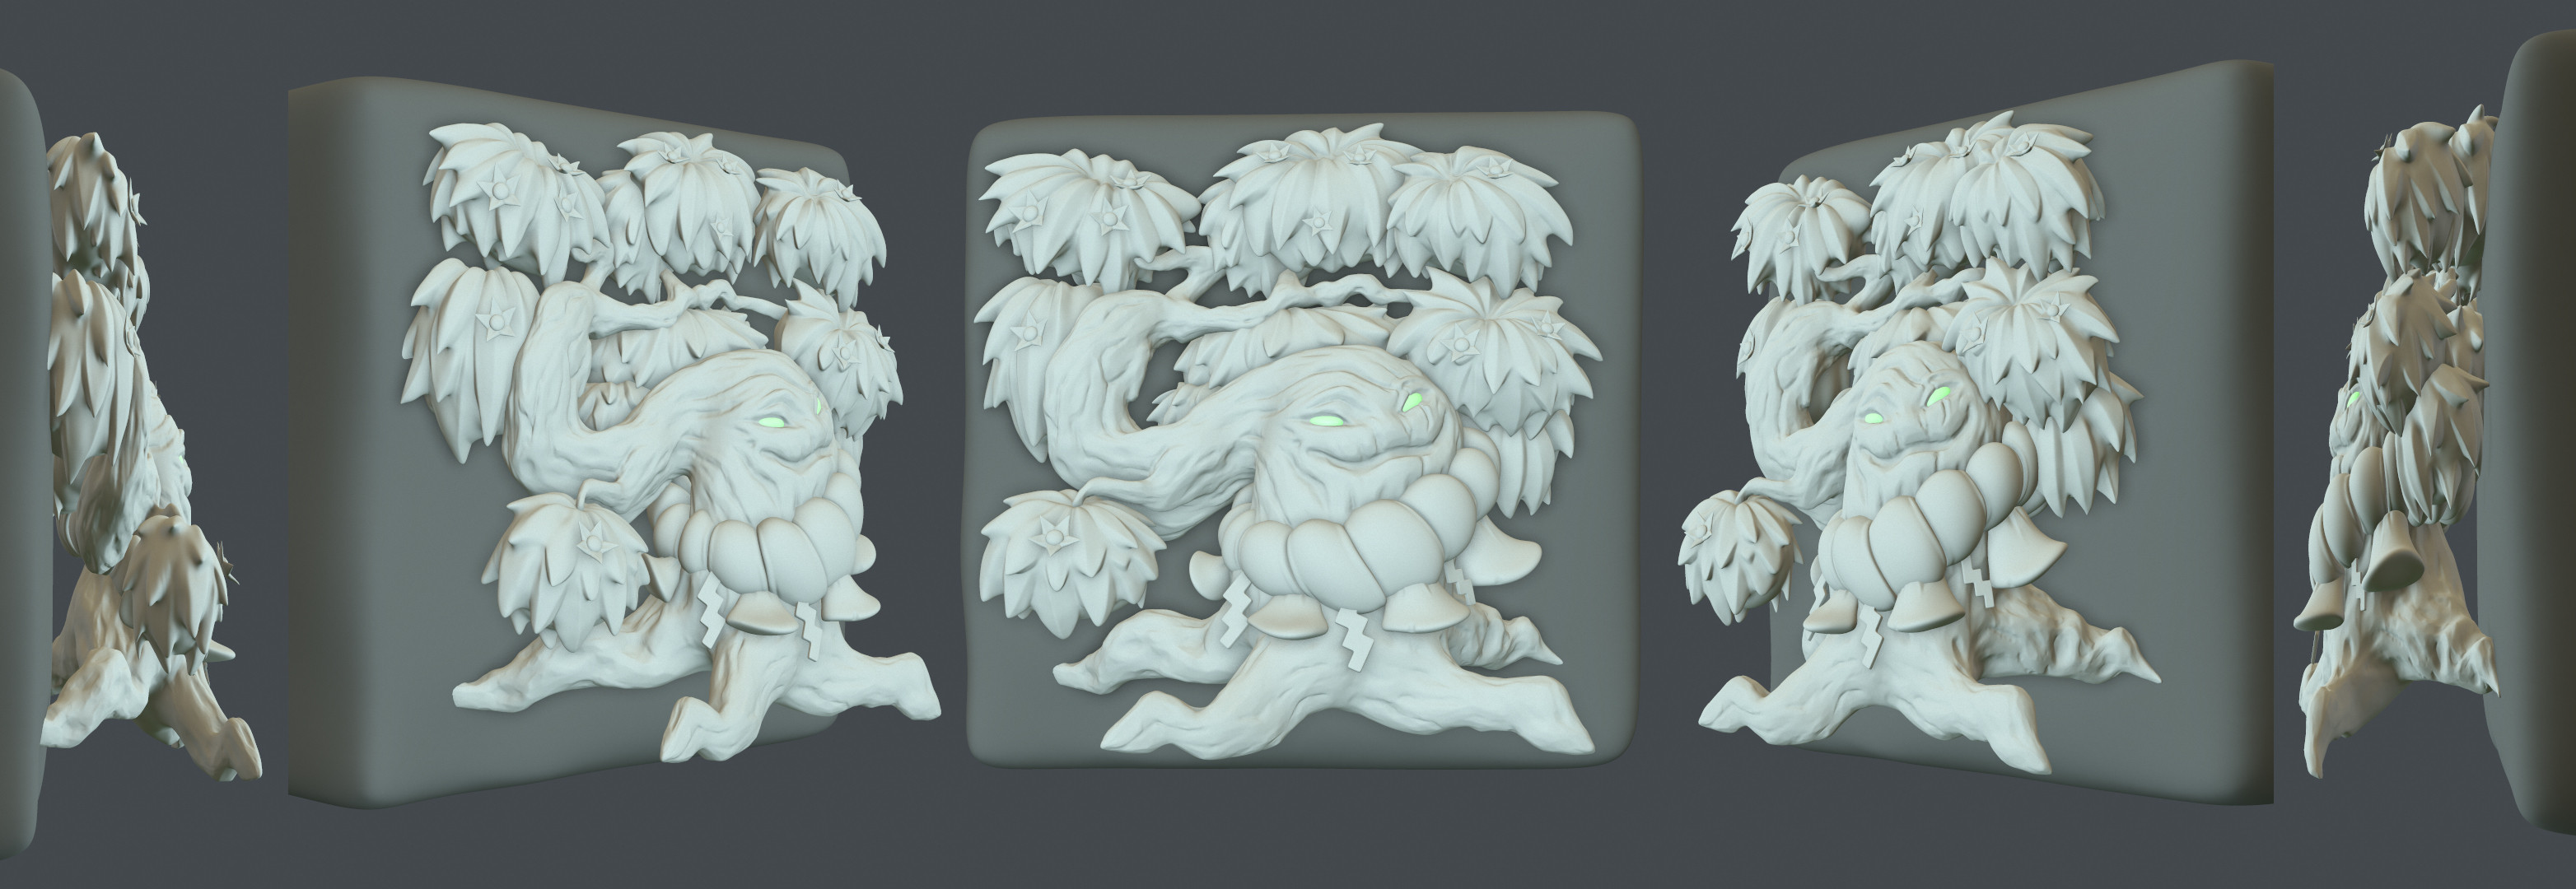 Highpoly Sculpt